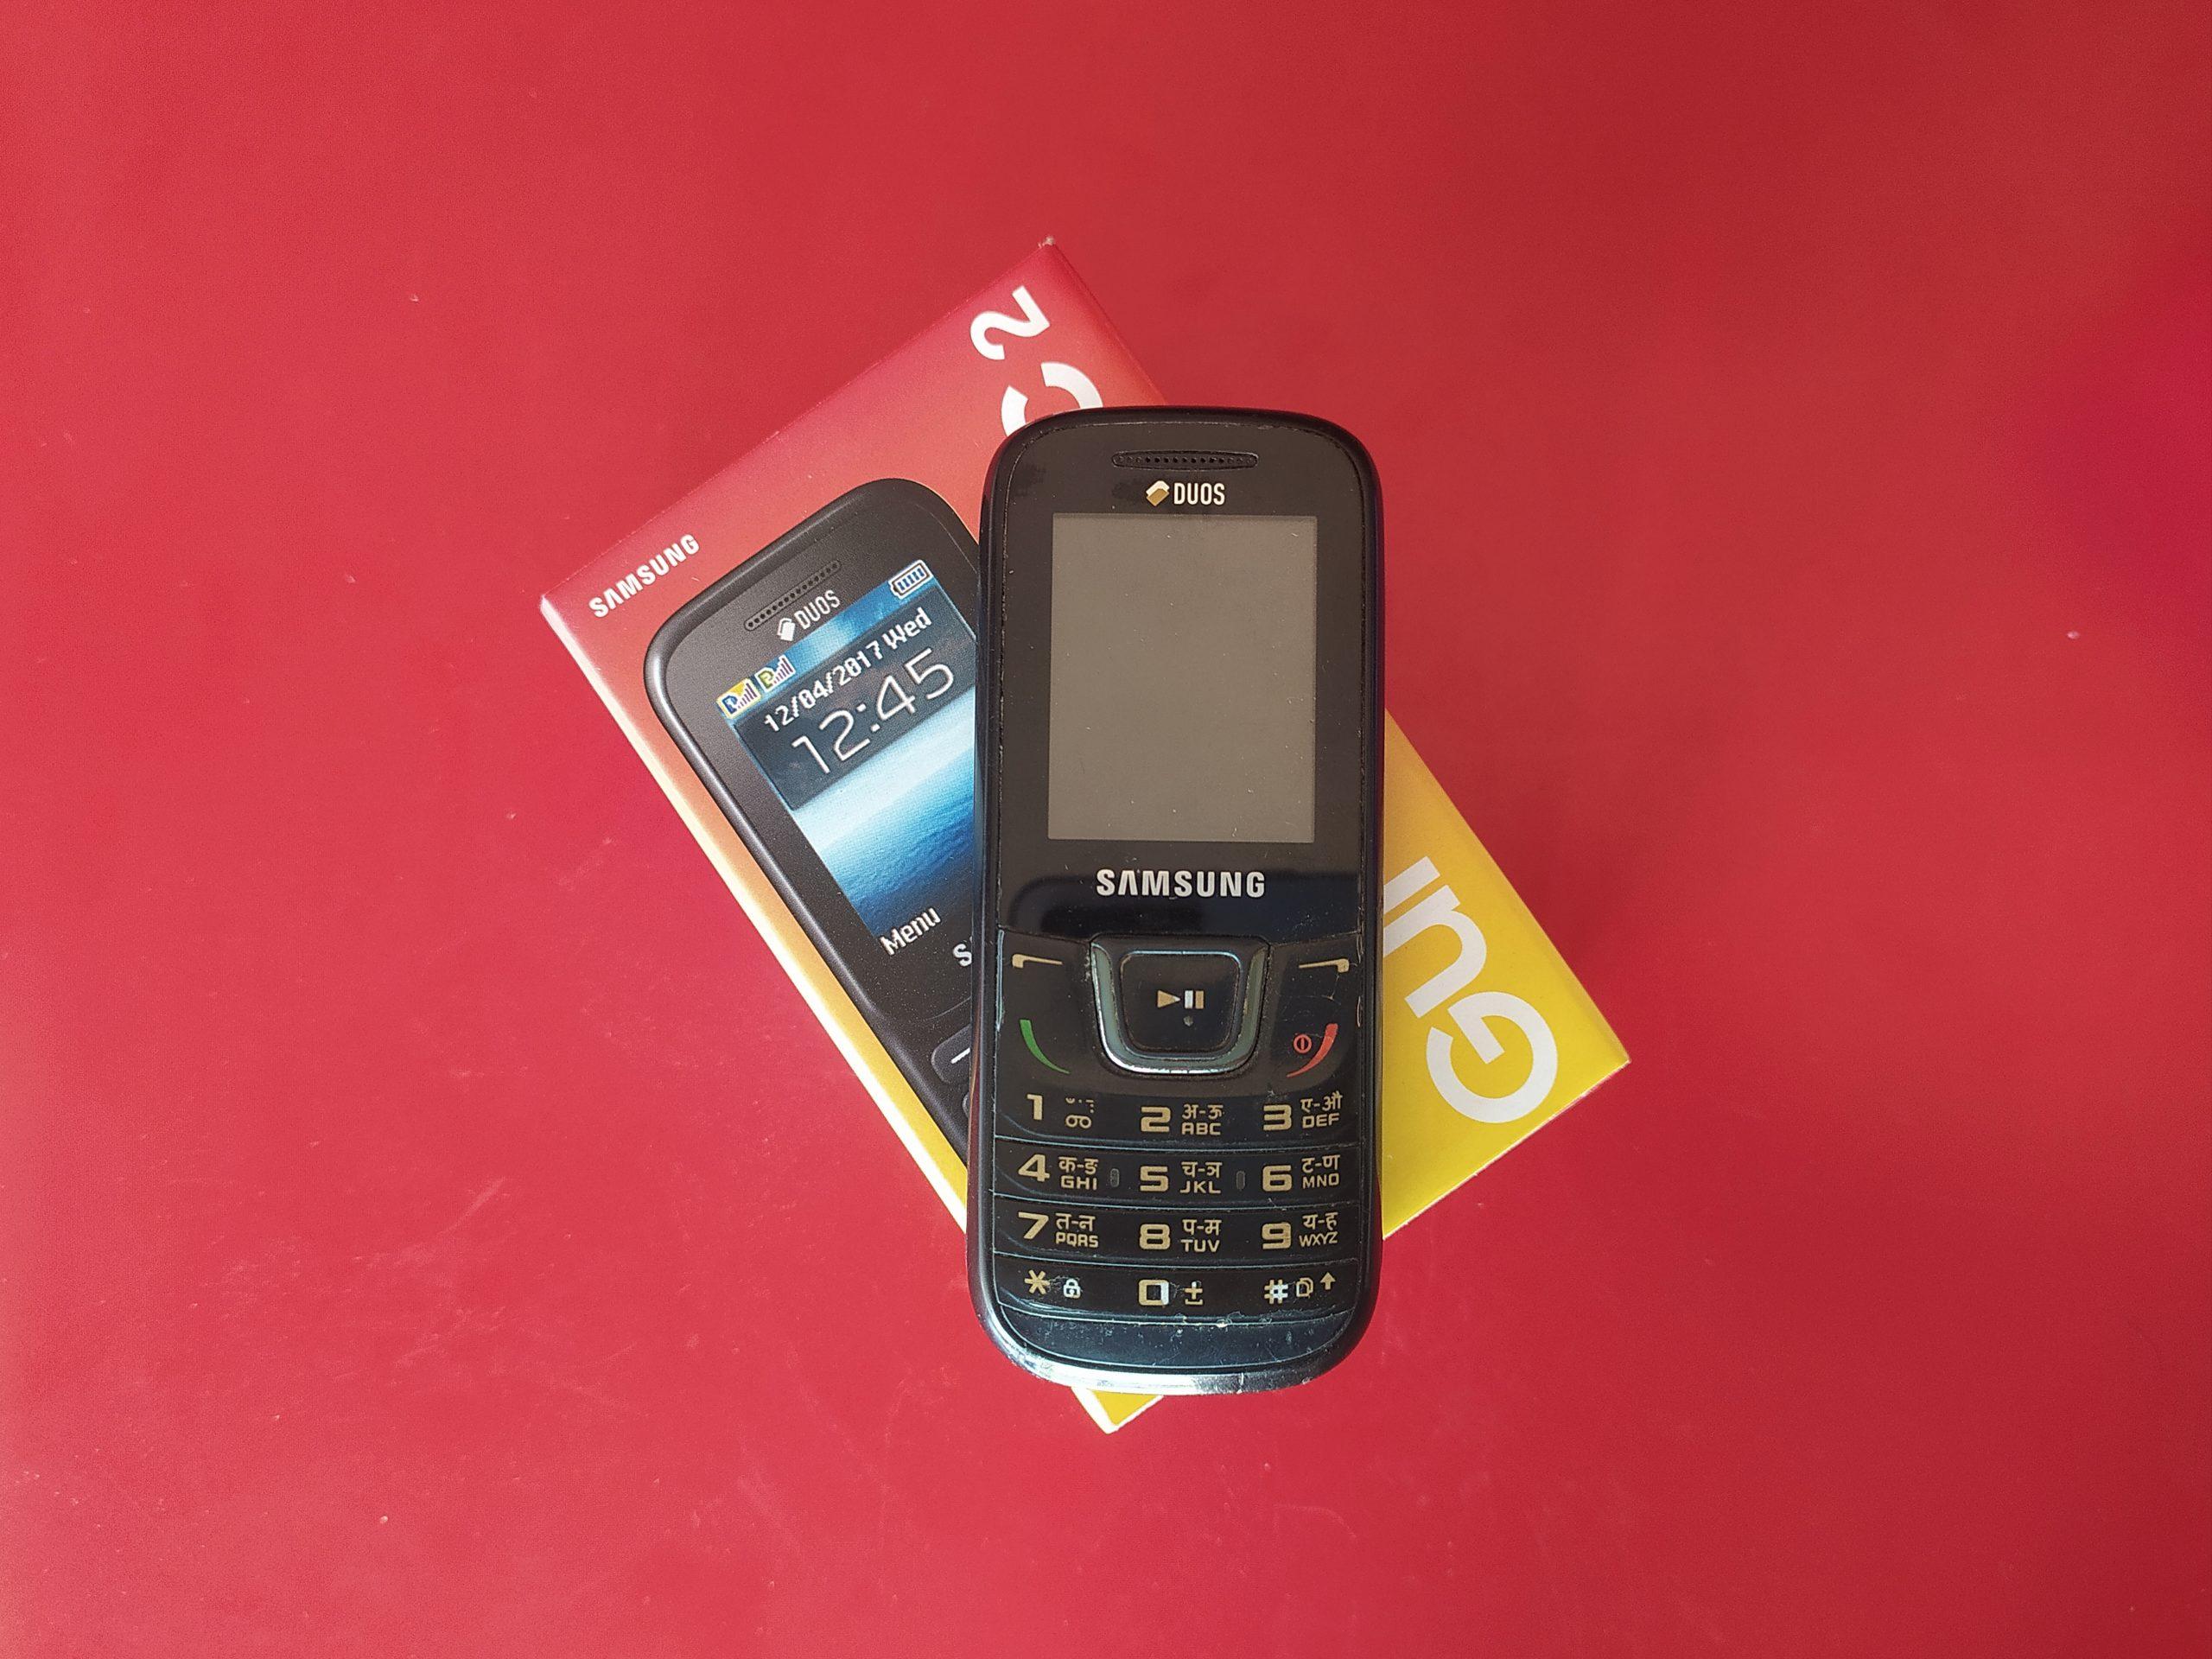 Samsung Moblie